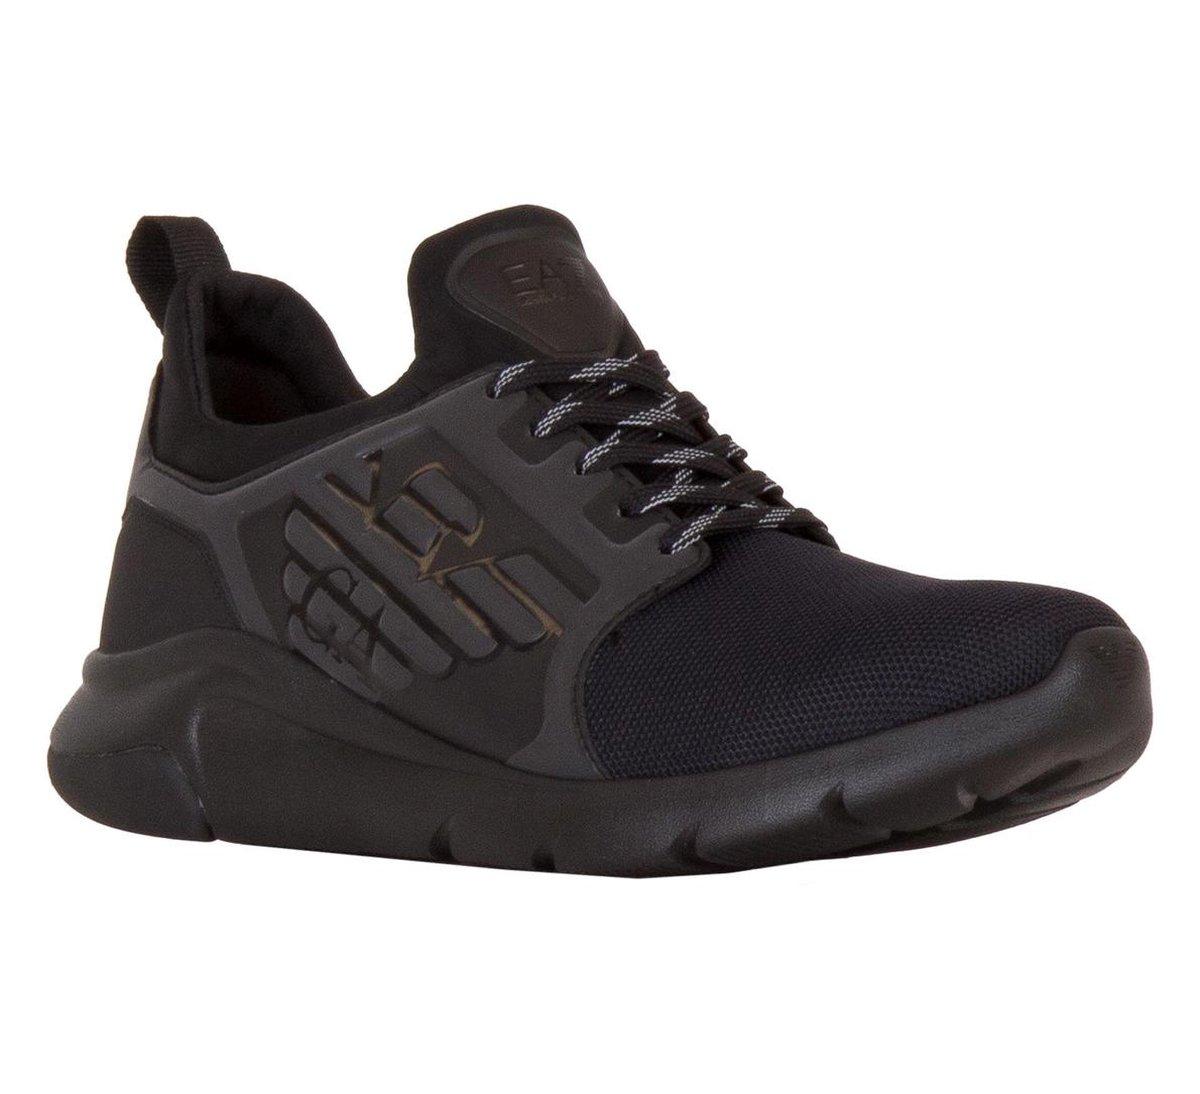 EA7 A Racer Reflex CC Sneakers - Maat 41 1/3 - Mannen - zwart uk6Kl